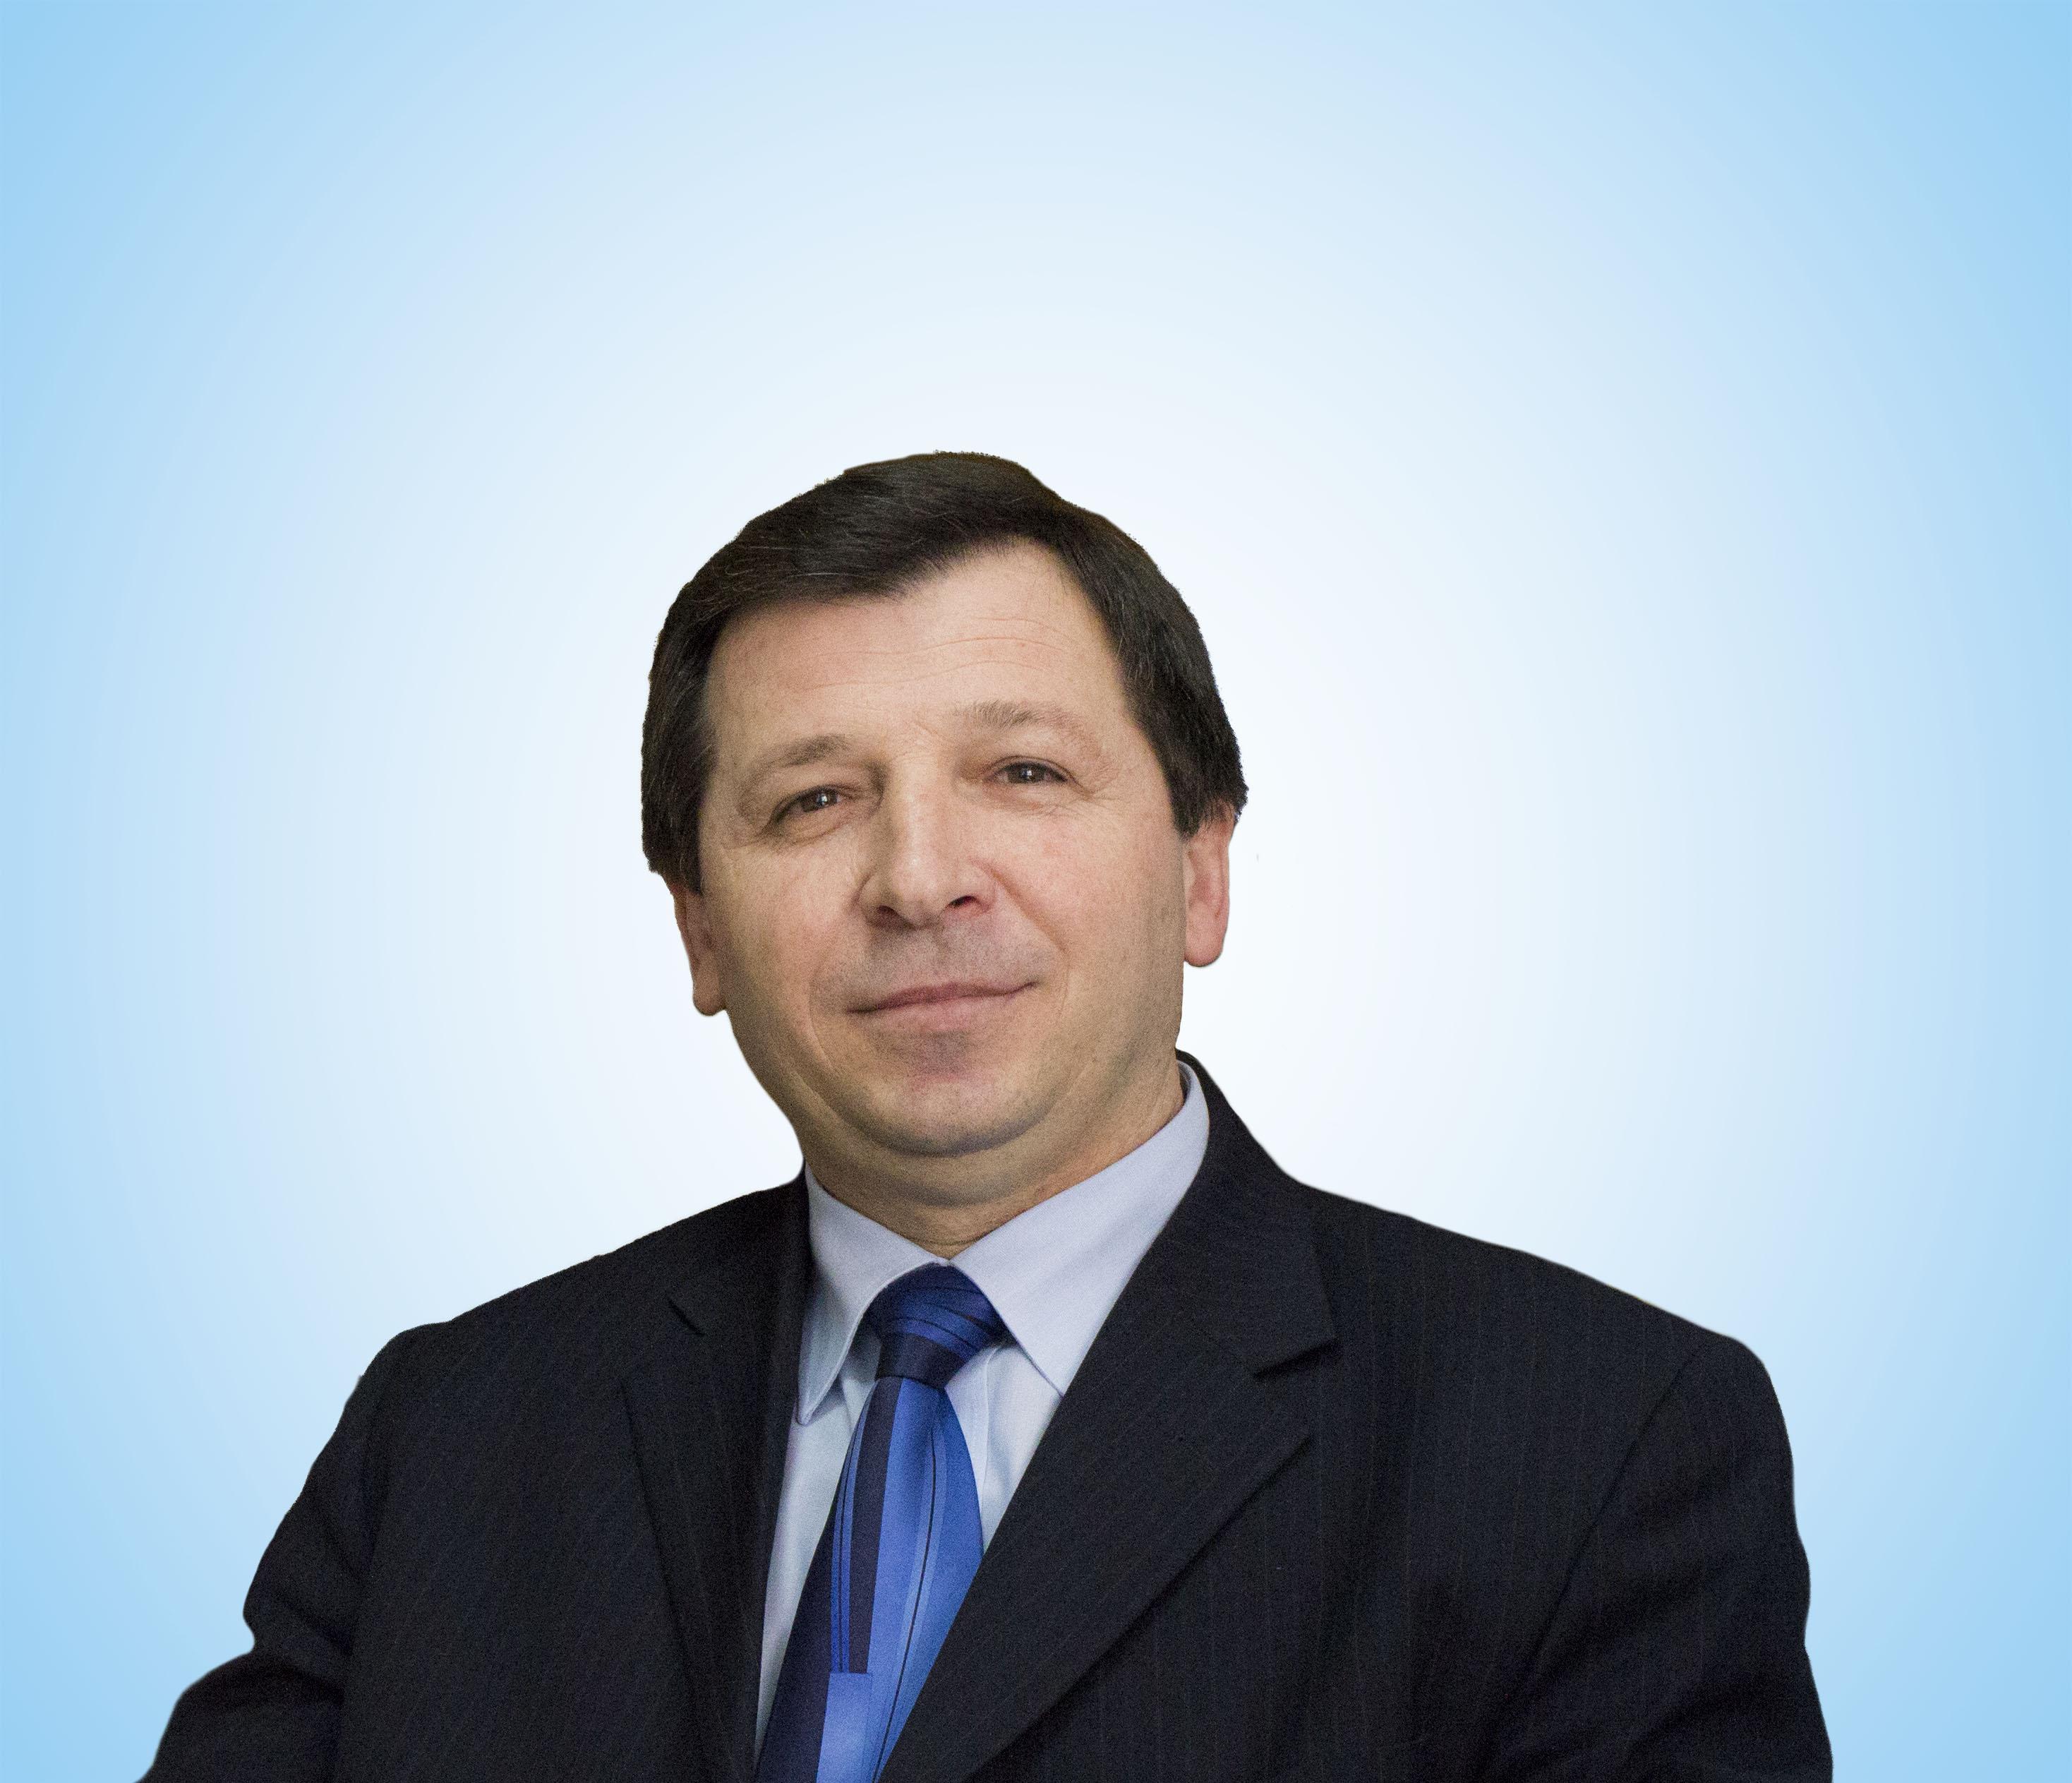 Serghei Namesnic